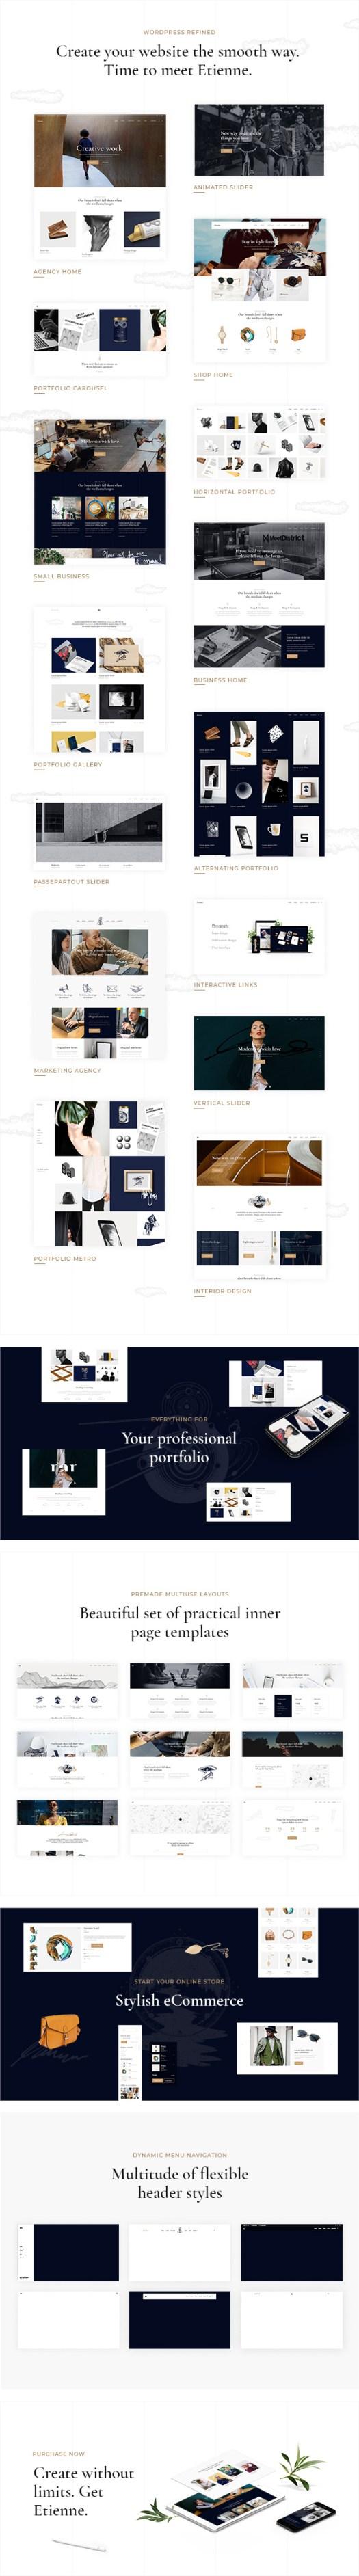 Etienne - Business WordPress Theme - 1